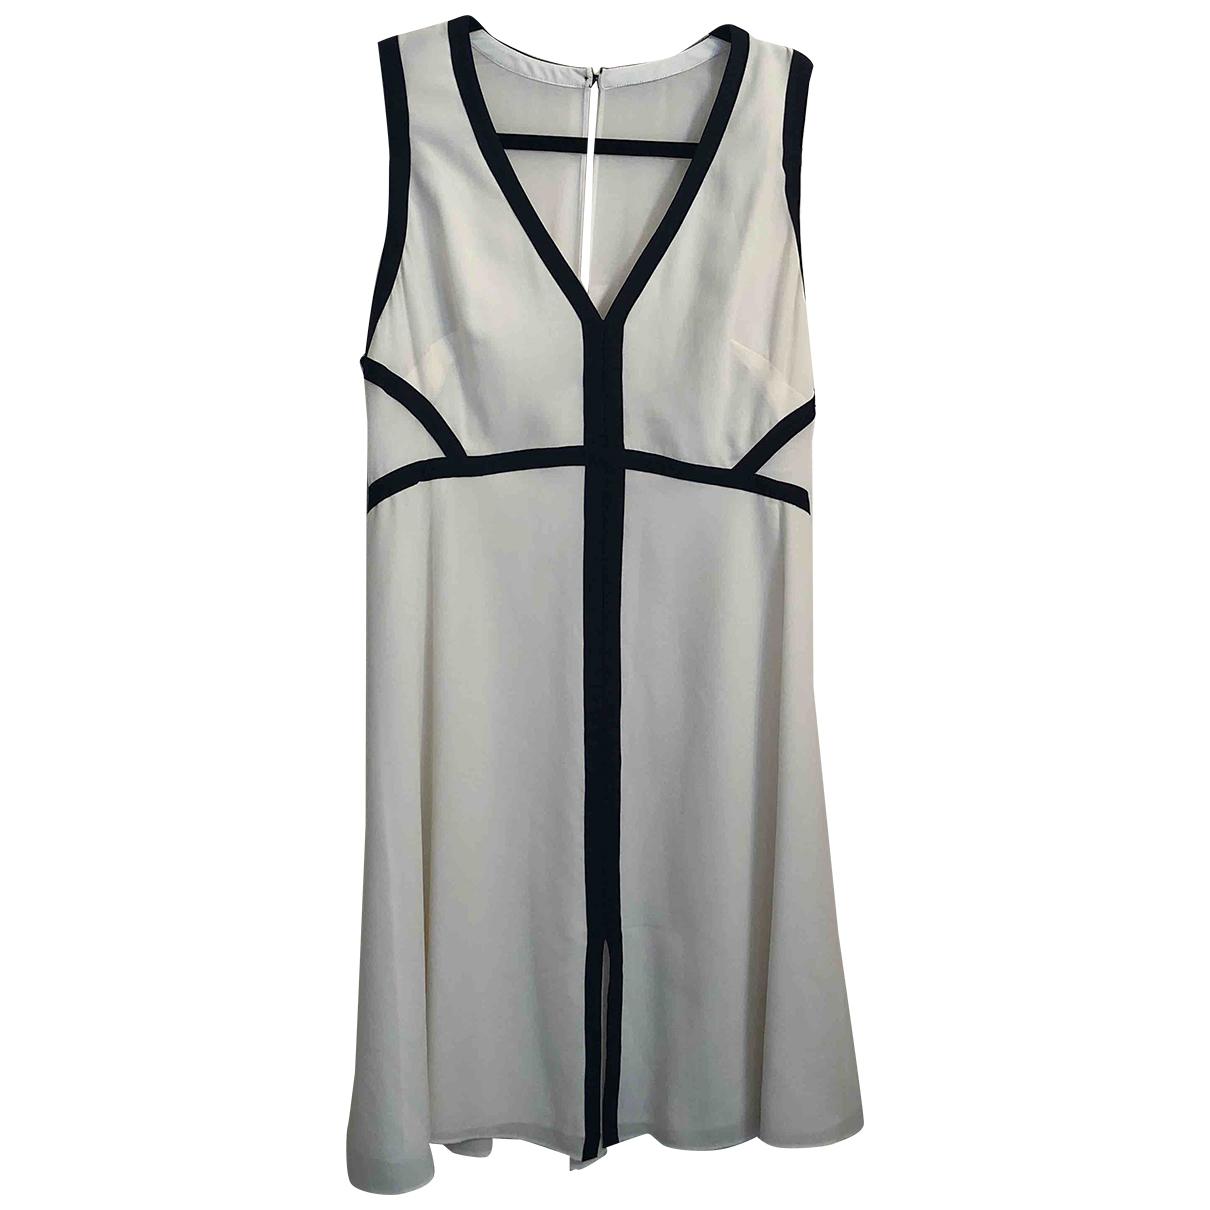 Reiss \N Ecru Silk dress for Women 12 UK